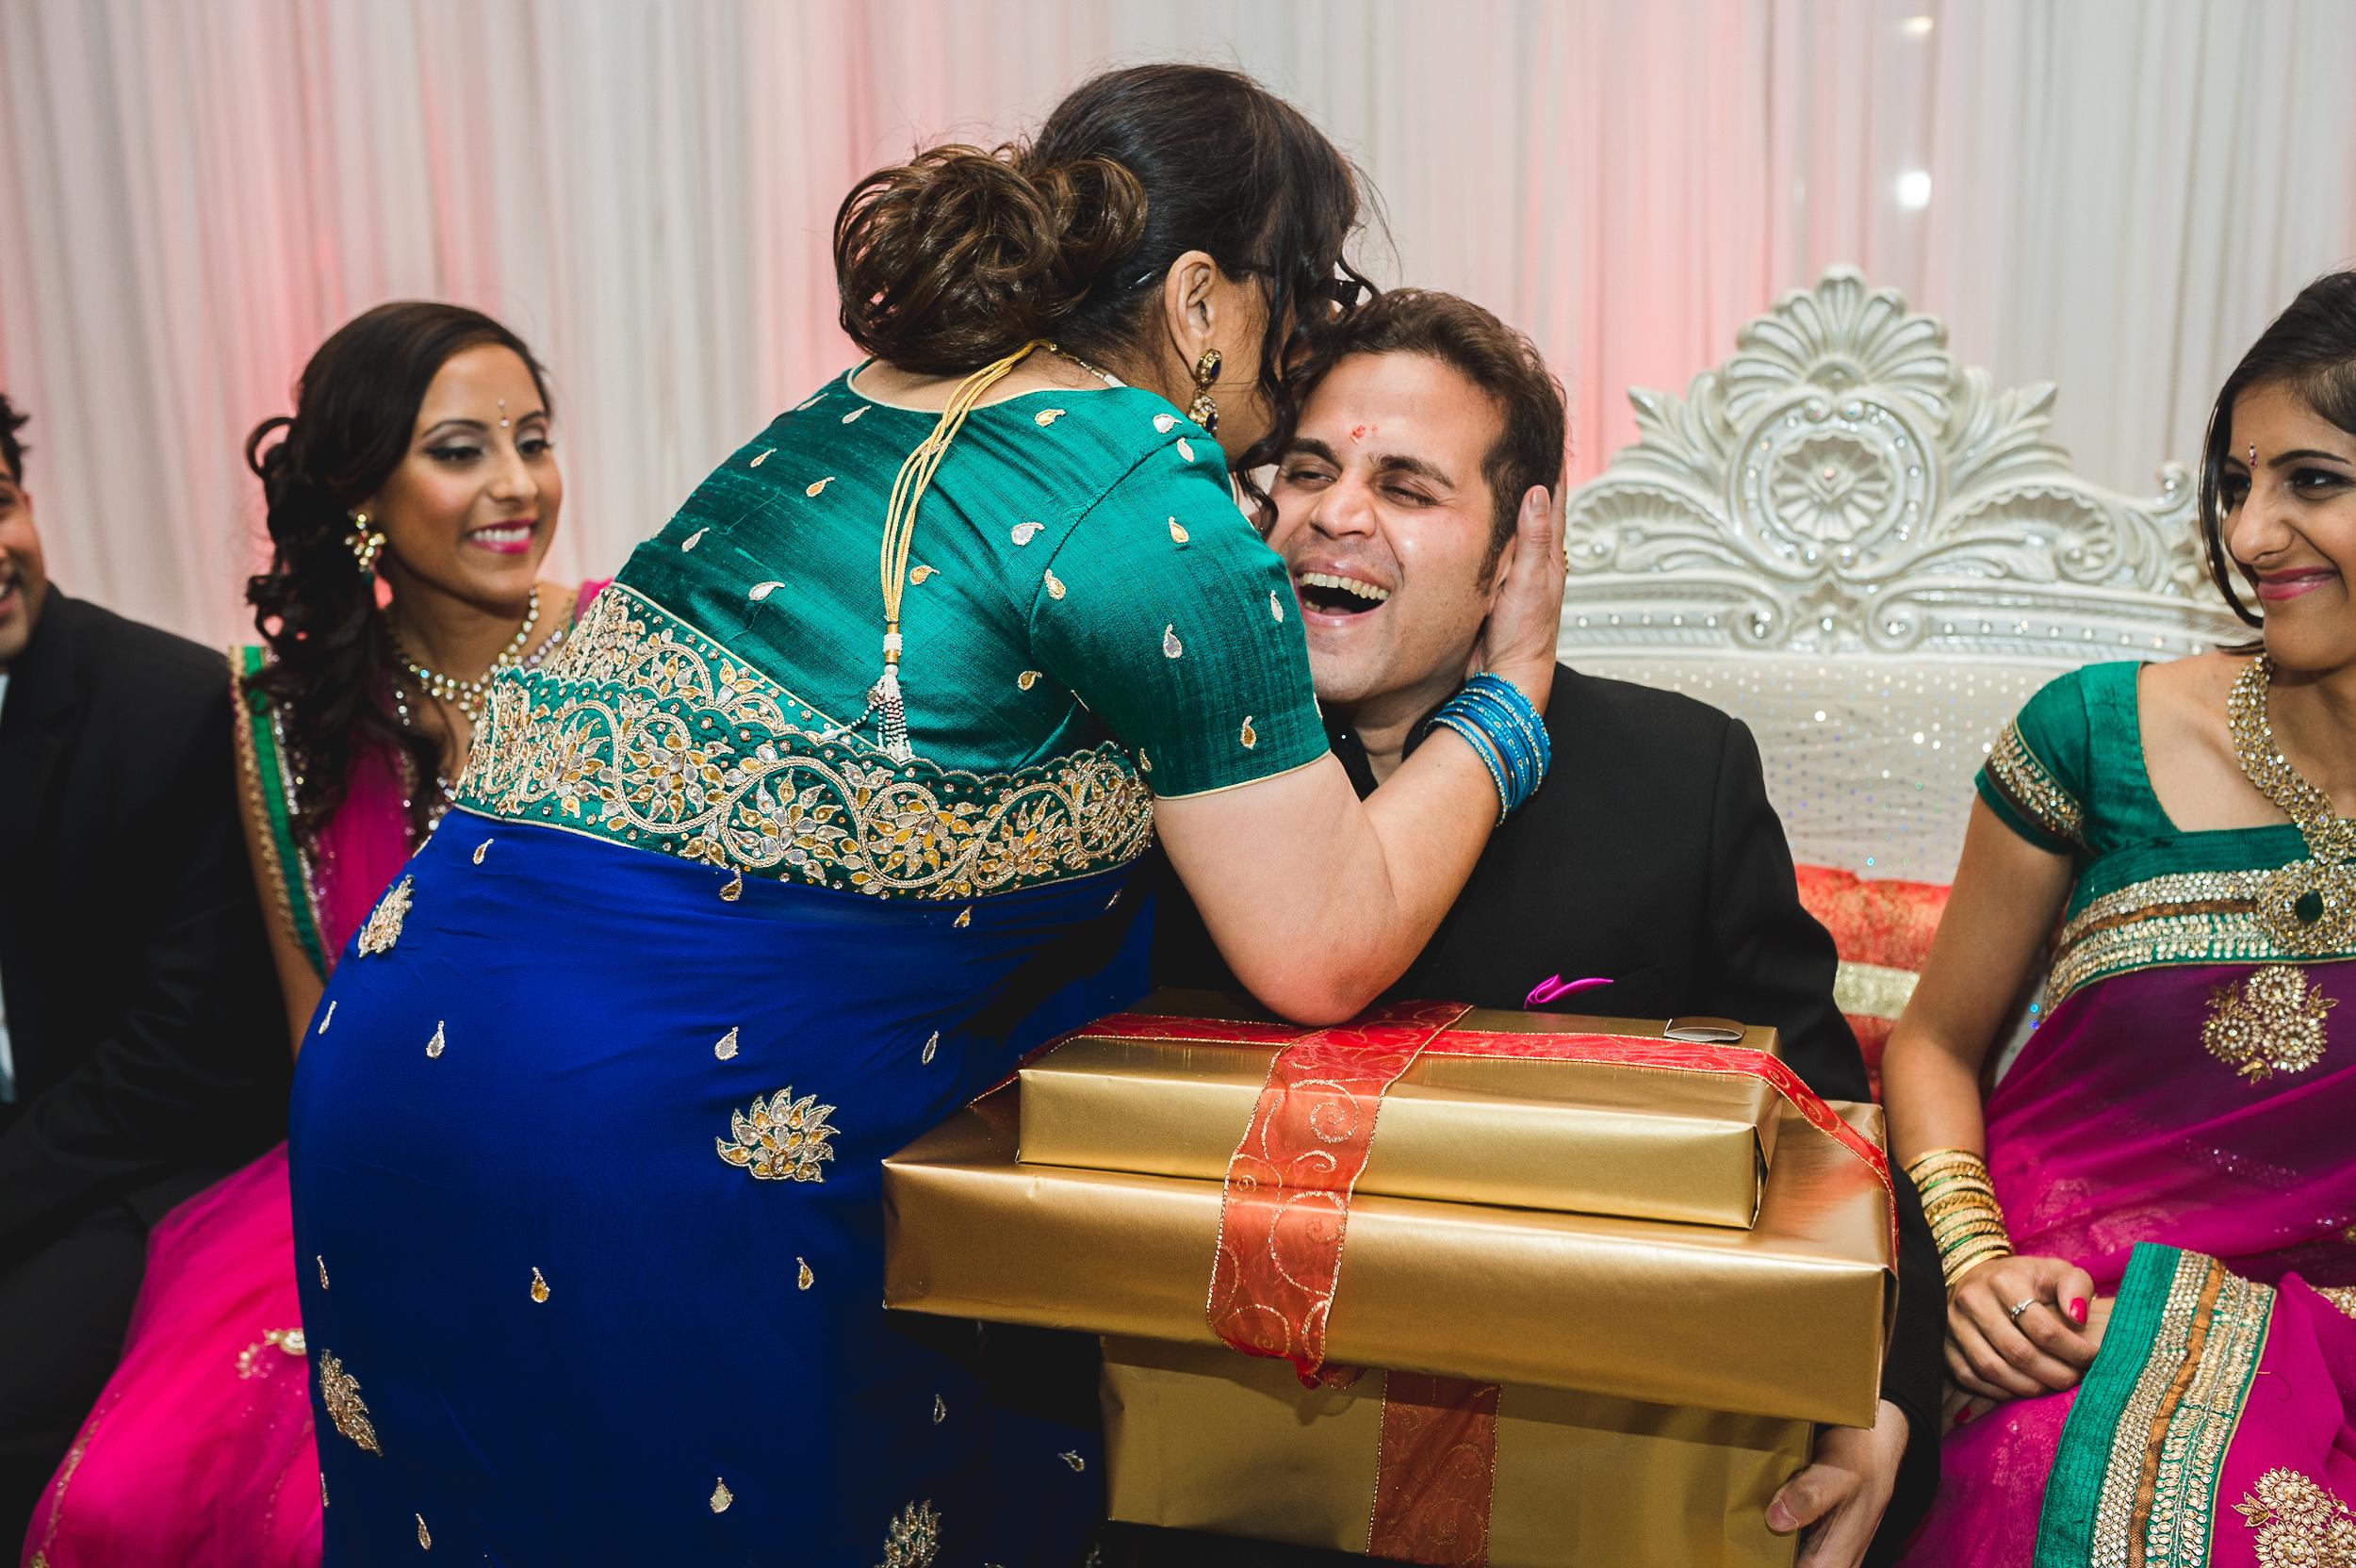 Indian wedding photographer washington dc Mantas Kubilinskas-11.jpg